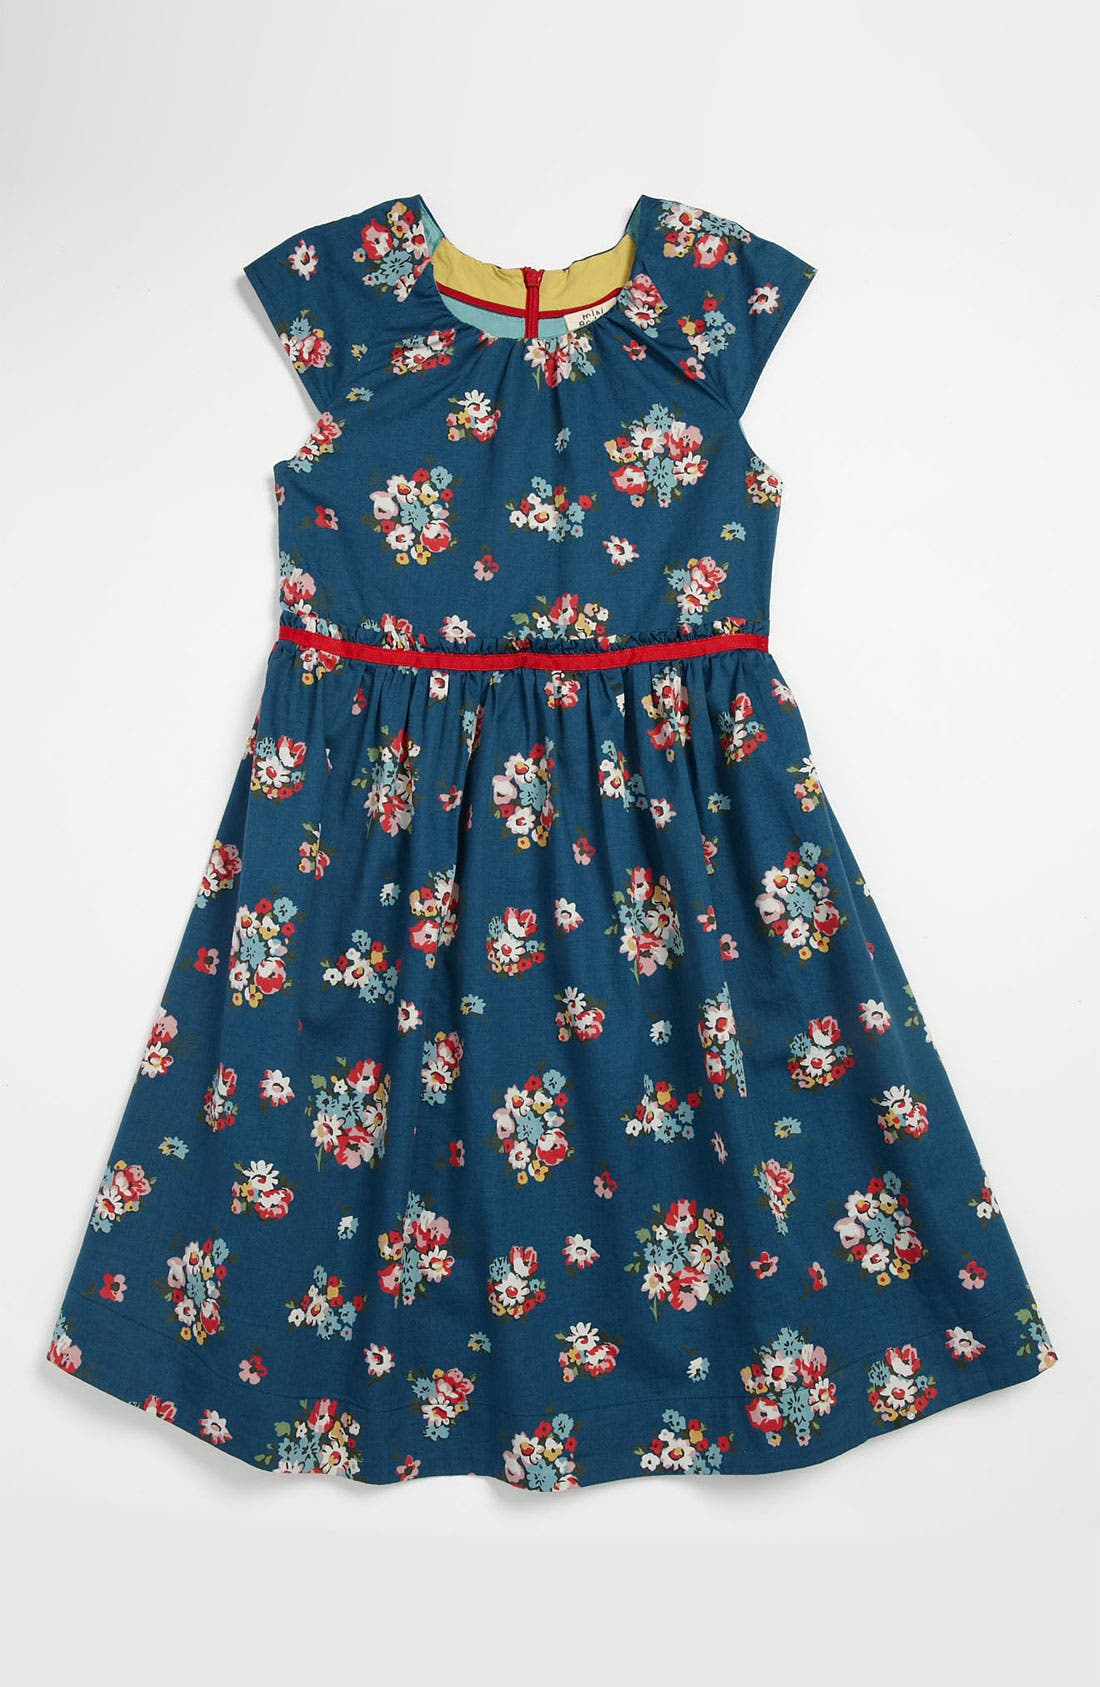 Alternate Image 1 Selected - Mini Boden Vintage Print Party Dress (Little Girls & Big Girls)